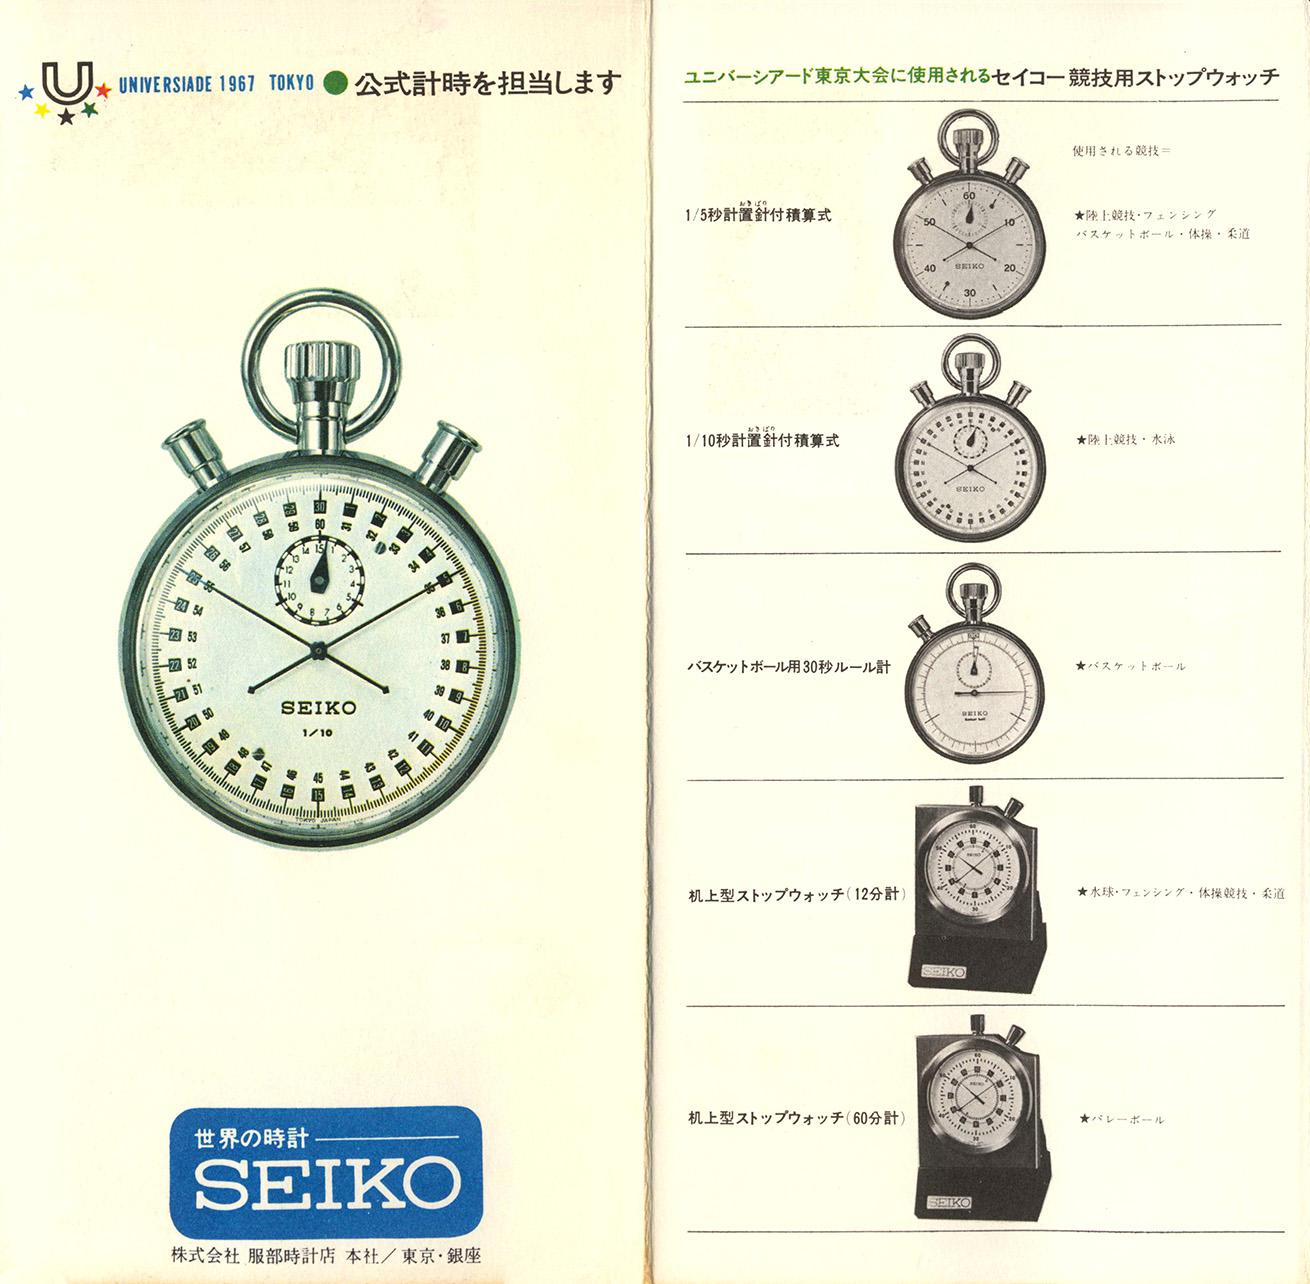 Universiade 1967 Seiko Brochure